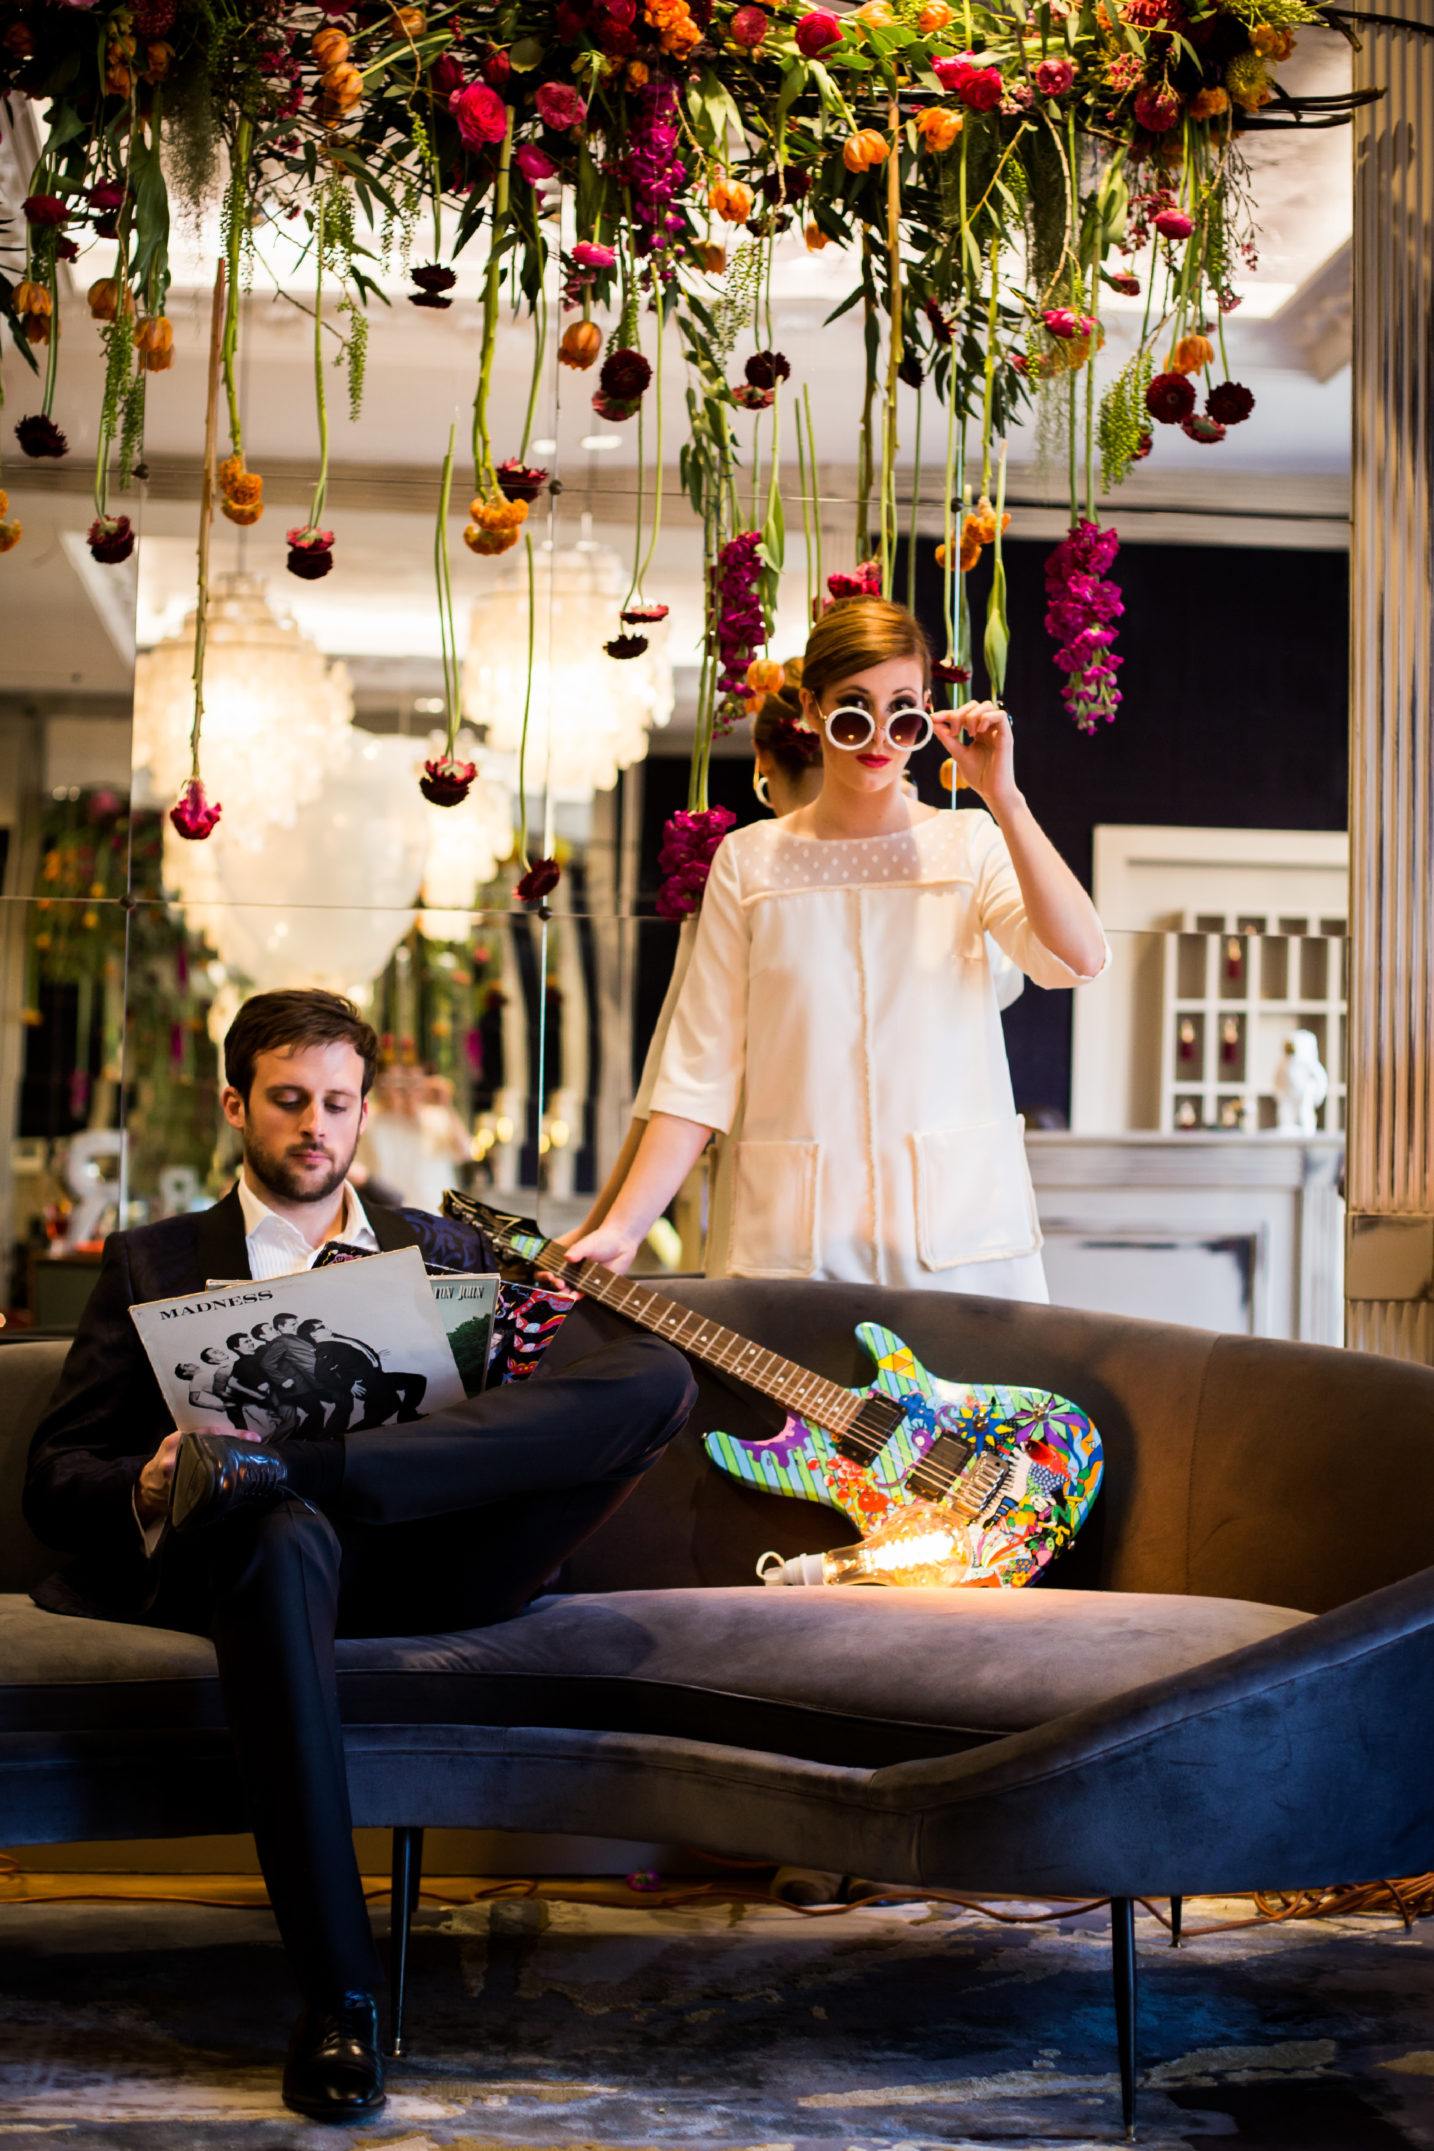 mariage rock inspiration Twiggy costume marié 17